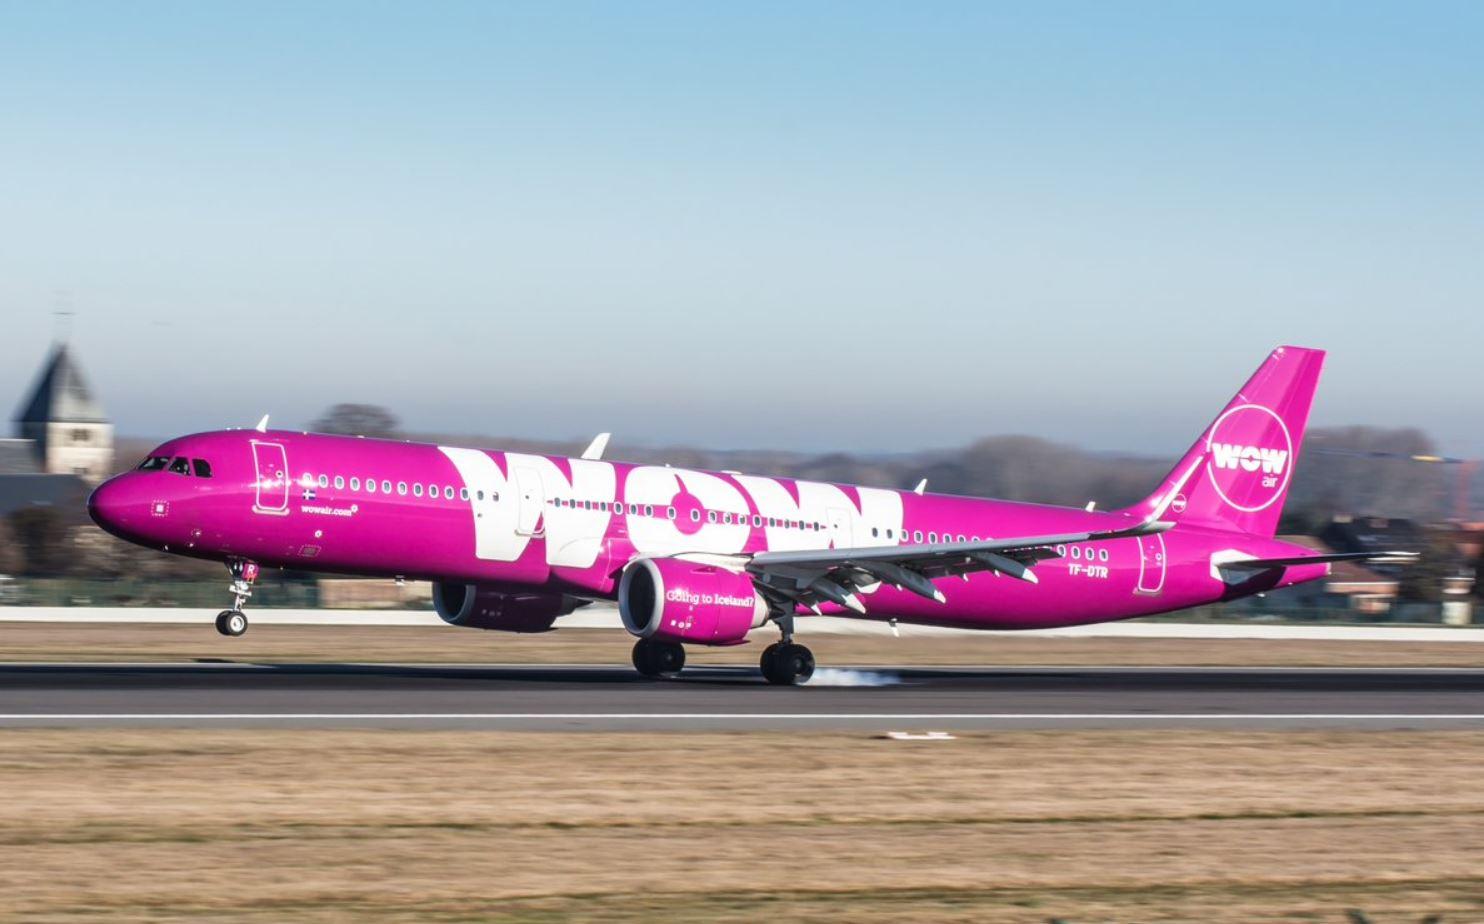 WOW Air's sudden shutdown leaves customers stranded